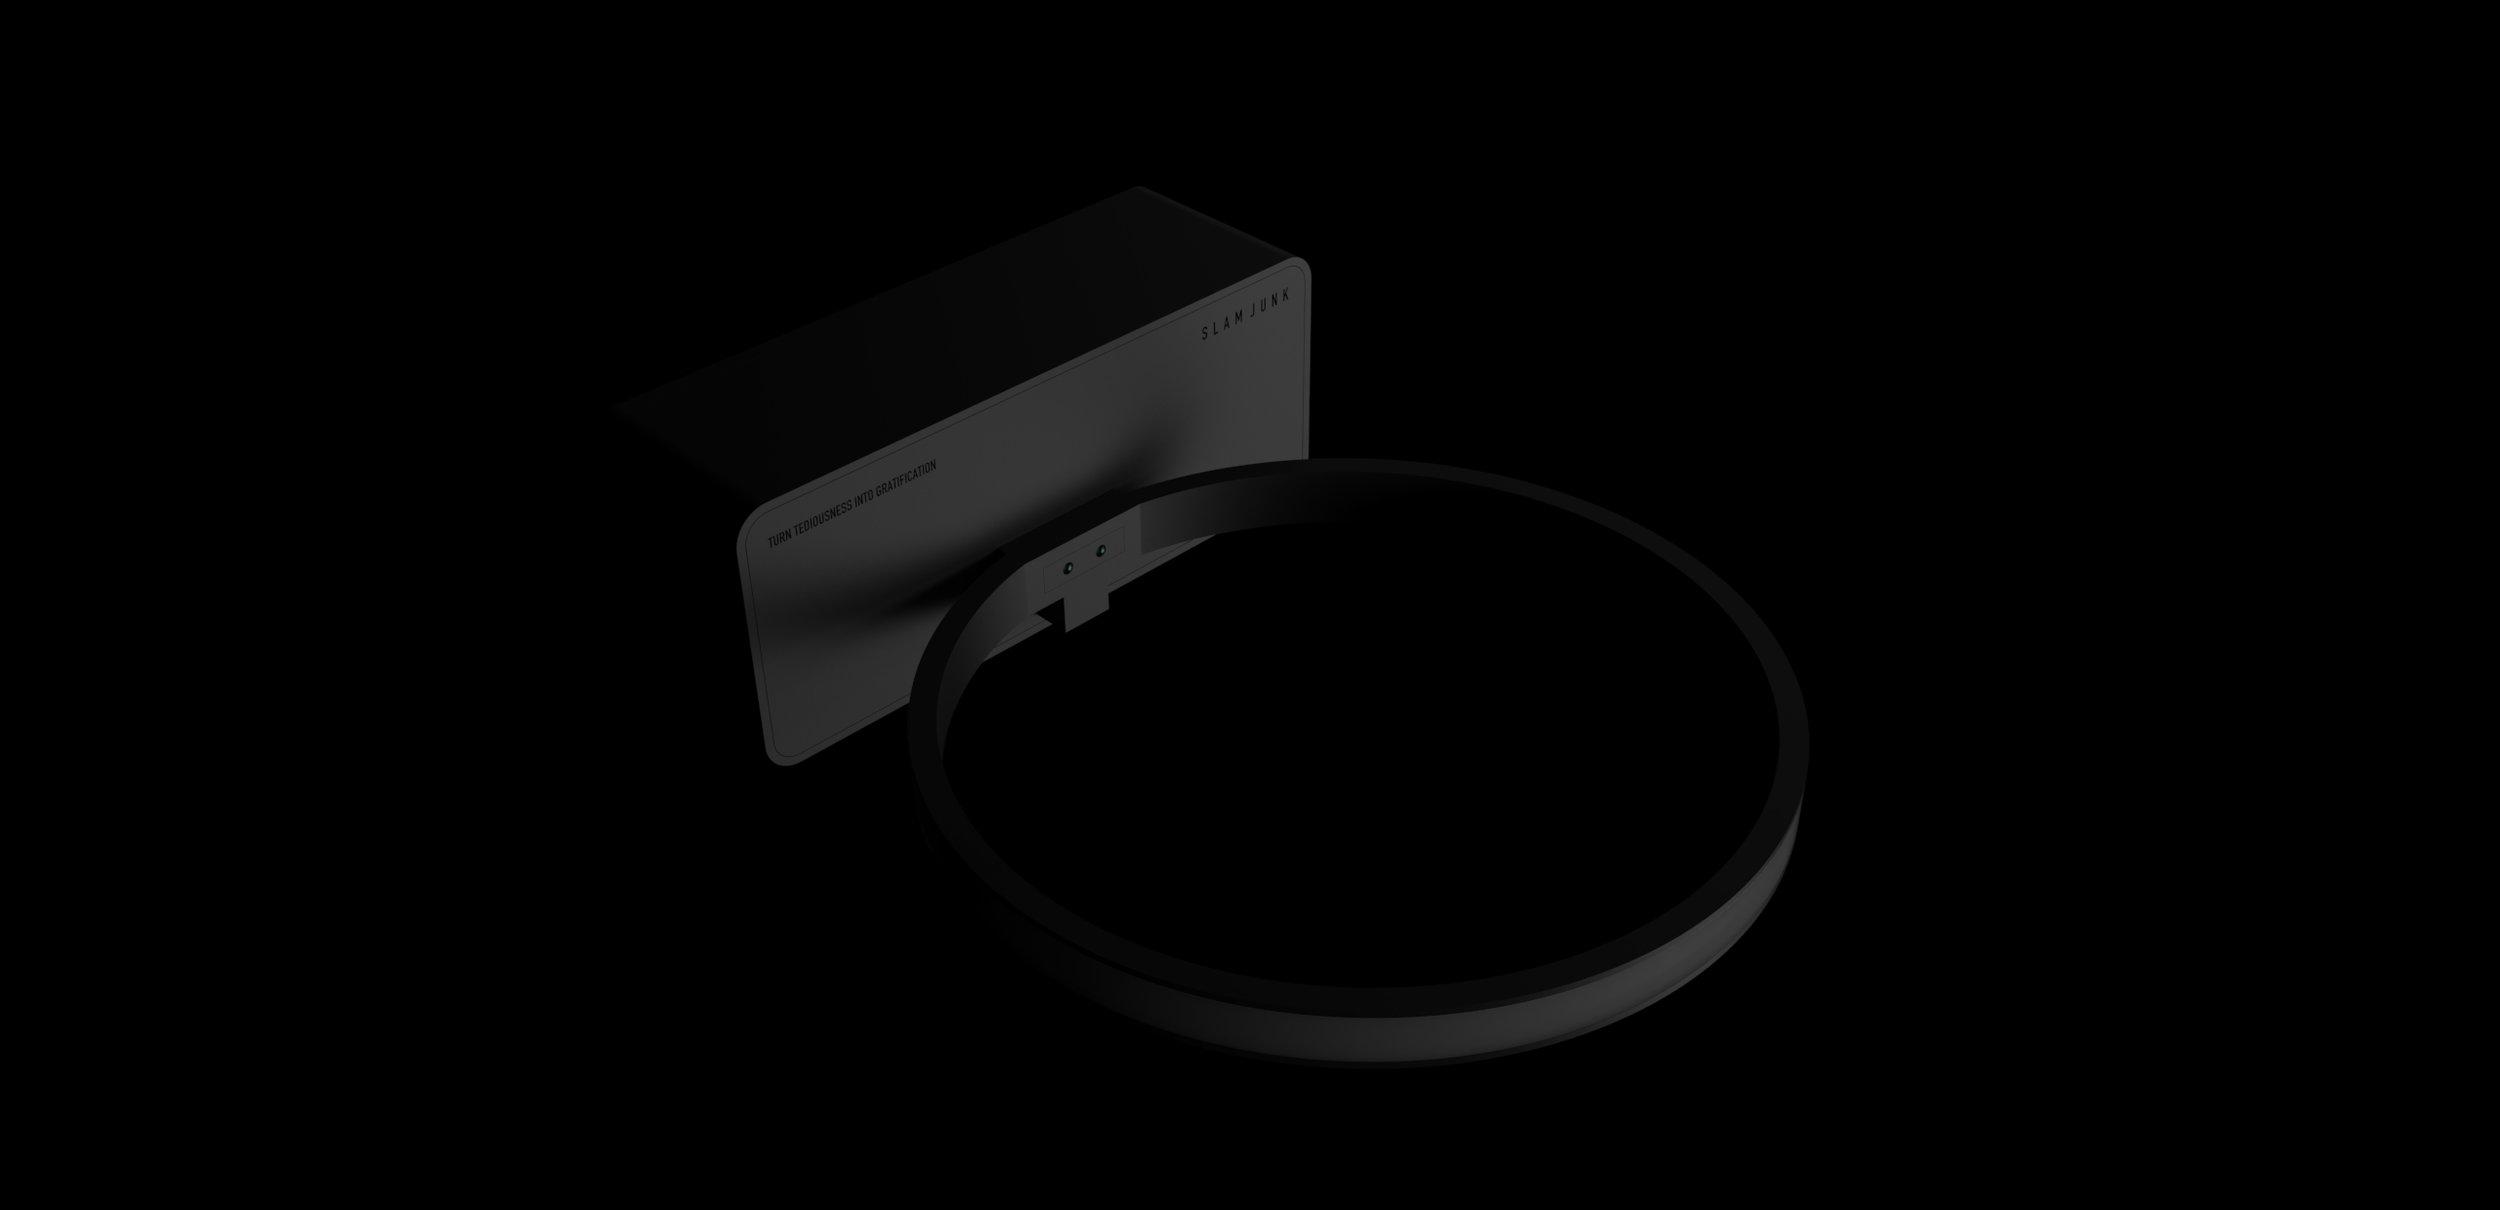 slam junk 酷黑细节渲染.78.jpg